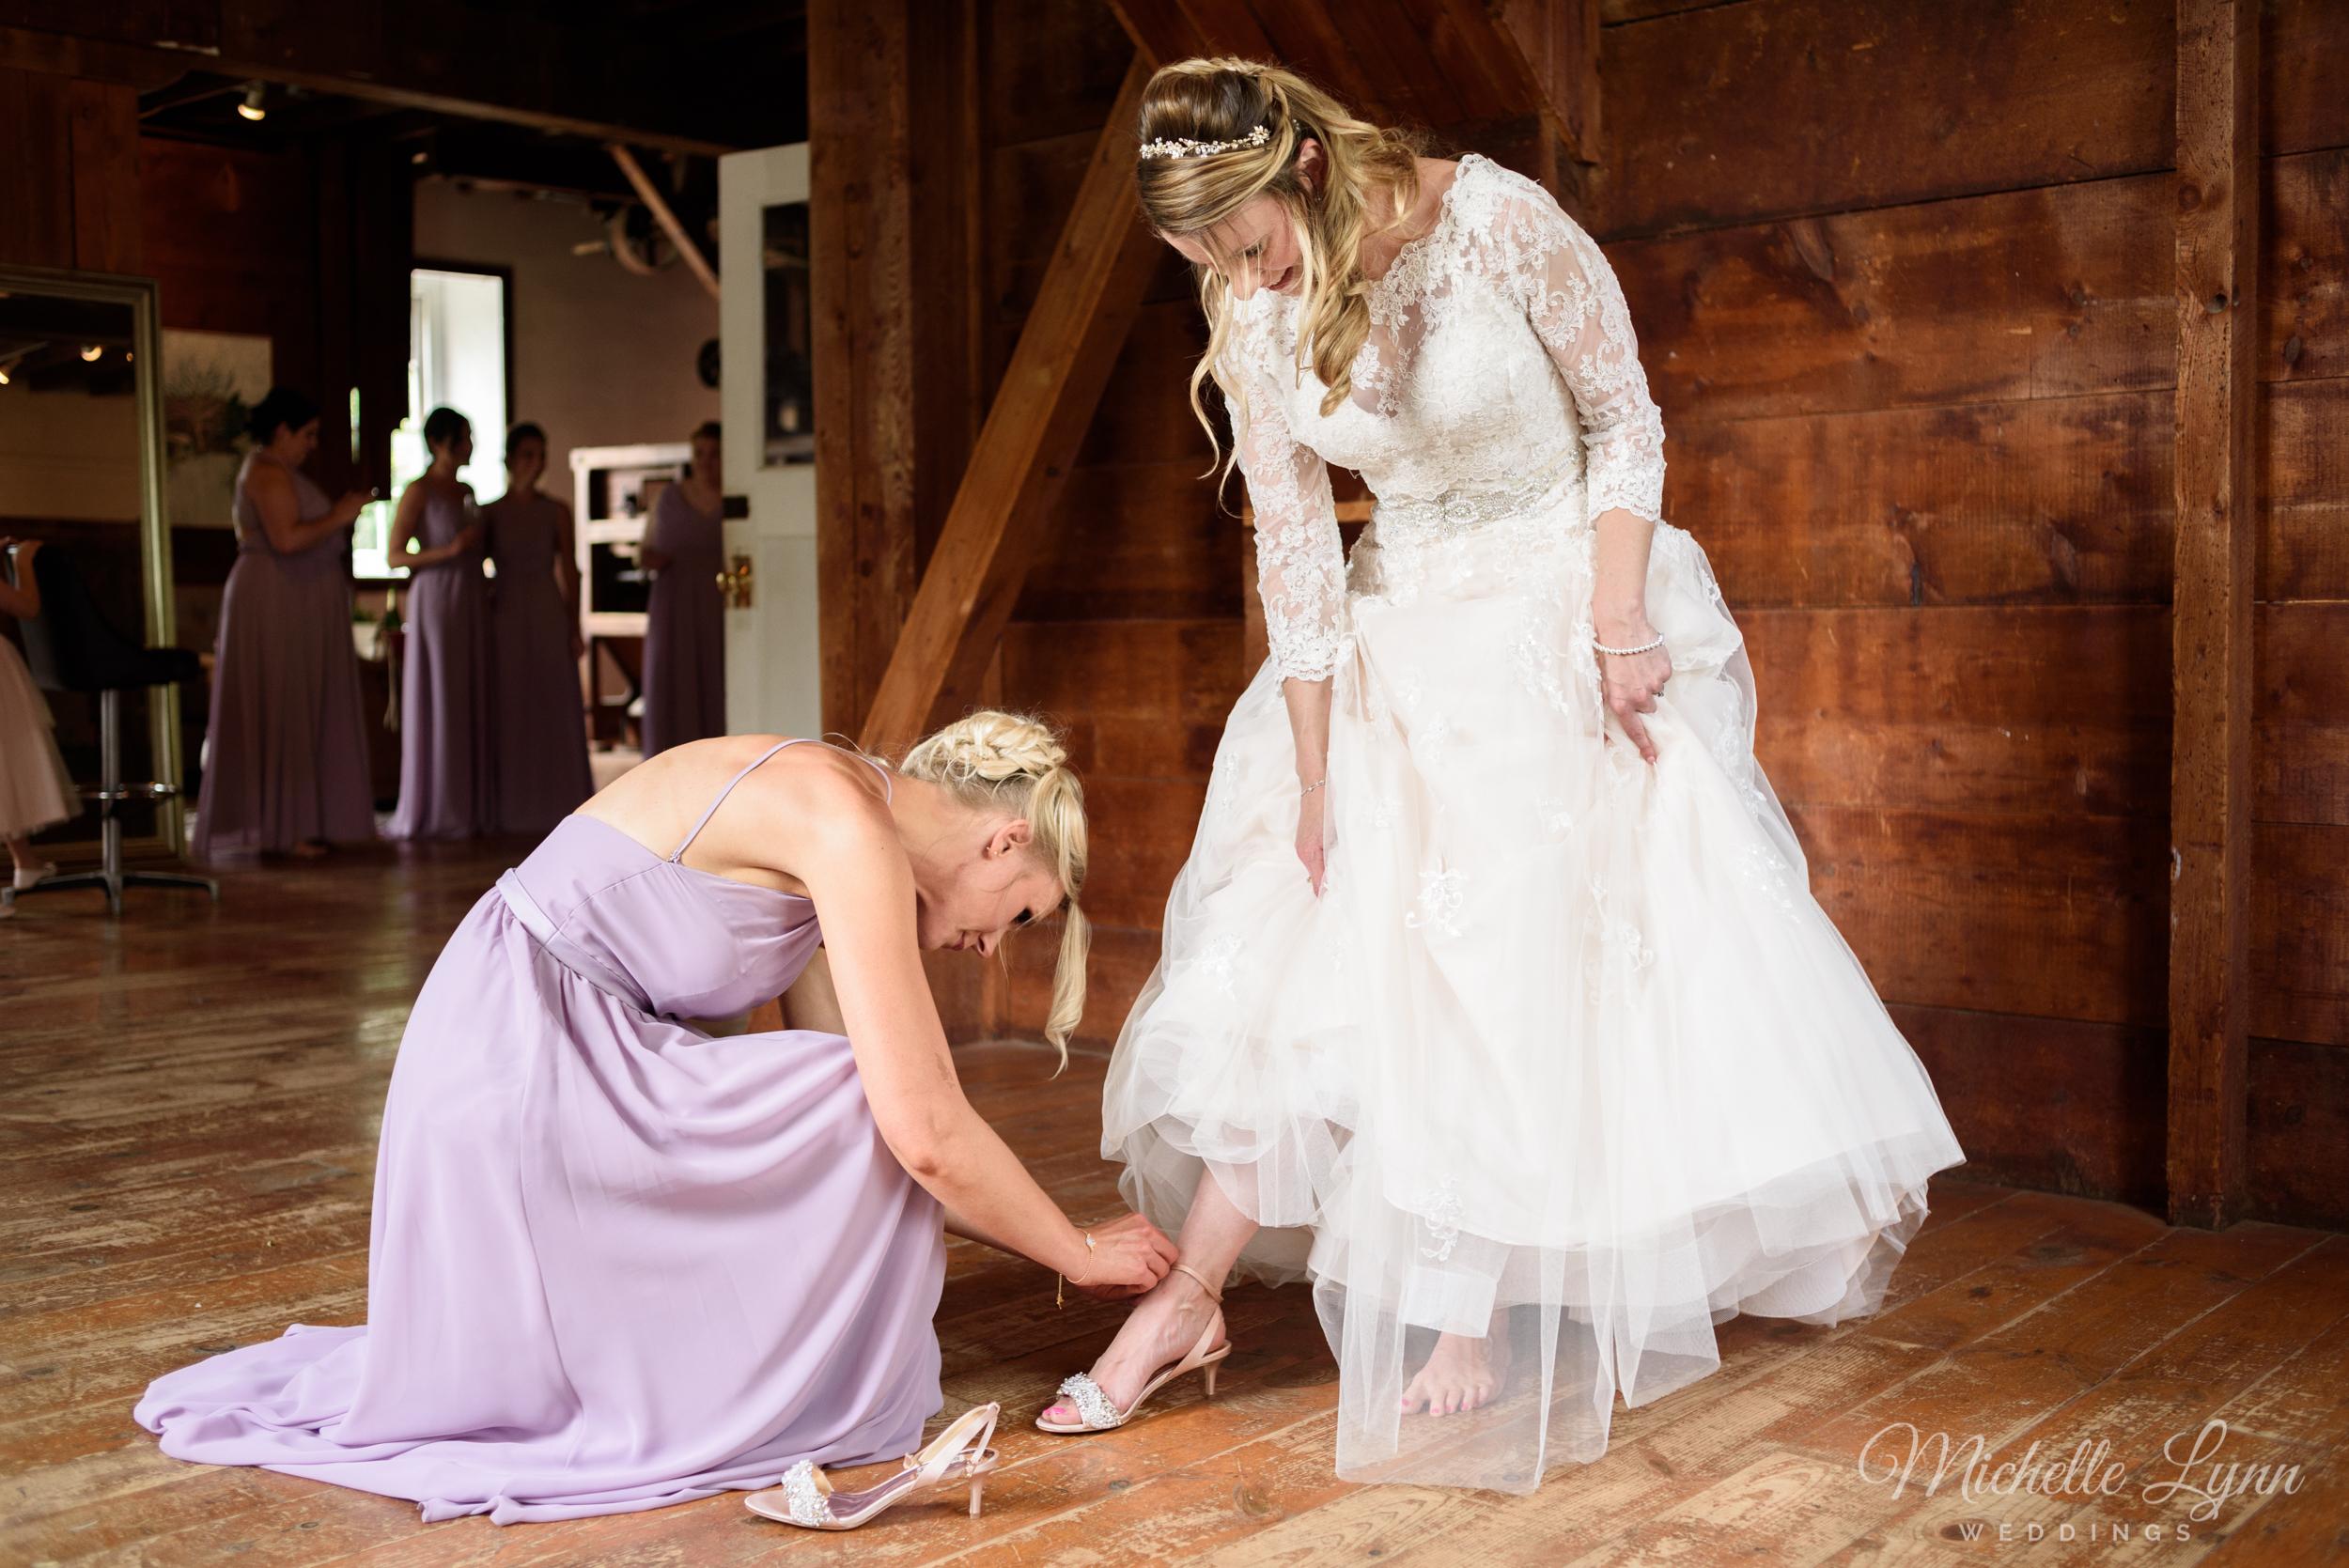 mlw-prallsville-mills-nj-wedding-photographer-9.jpg